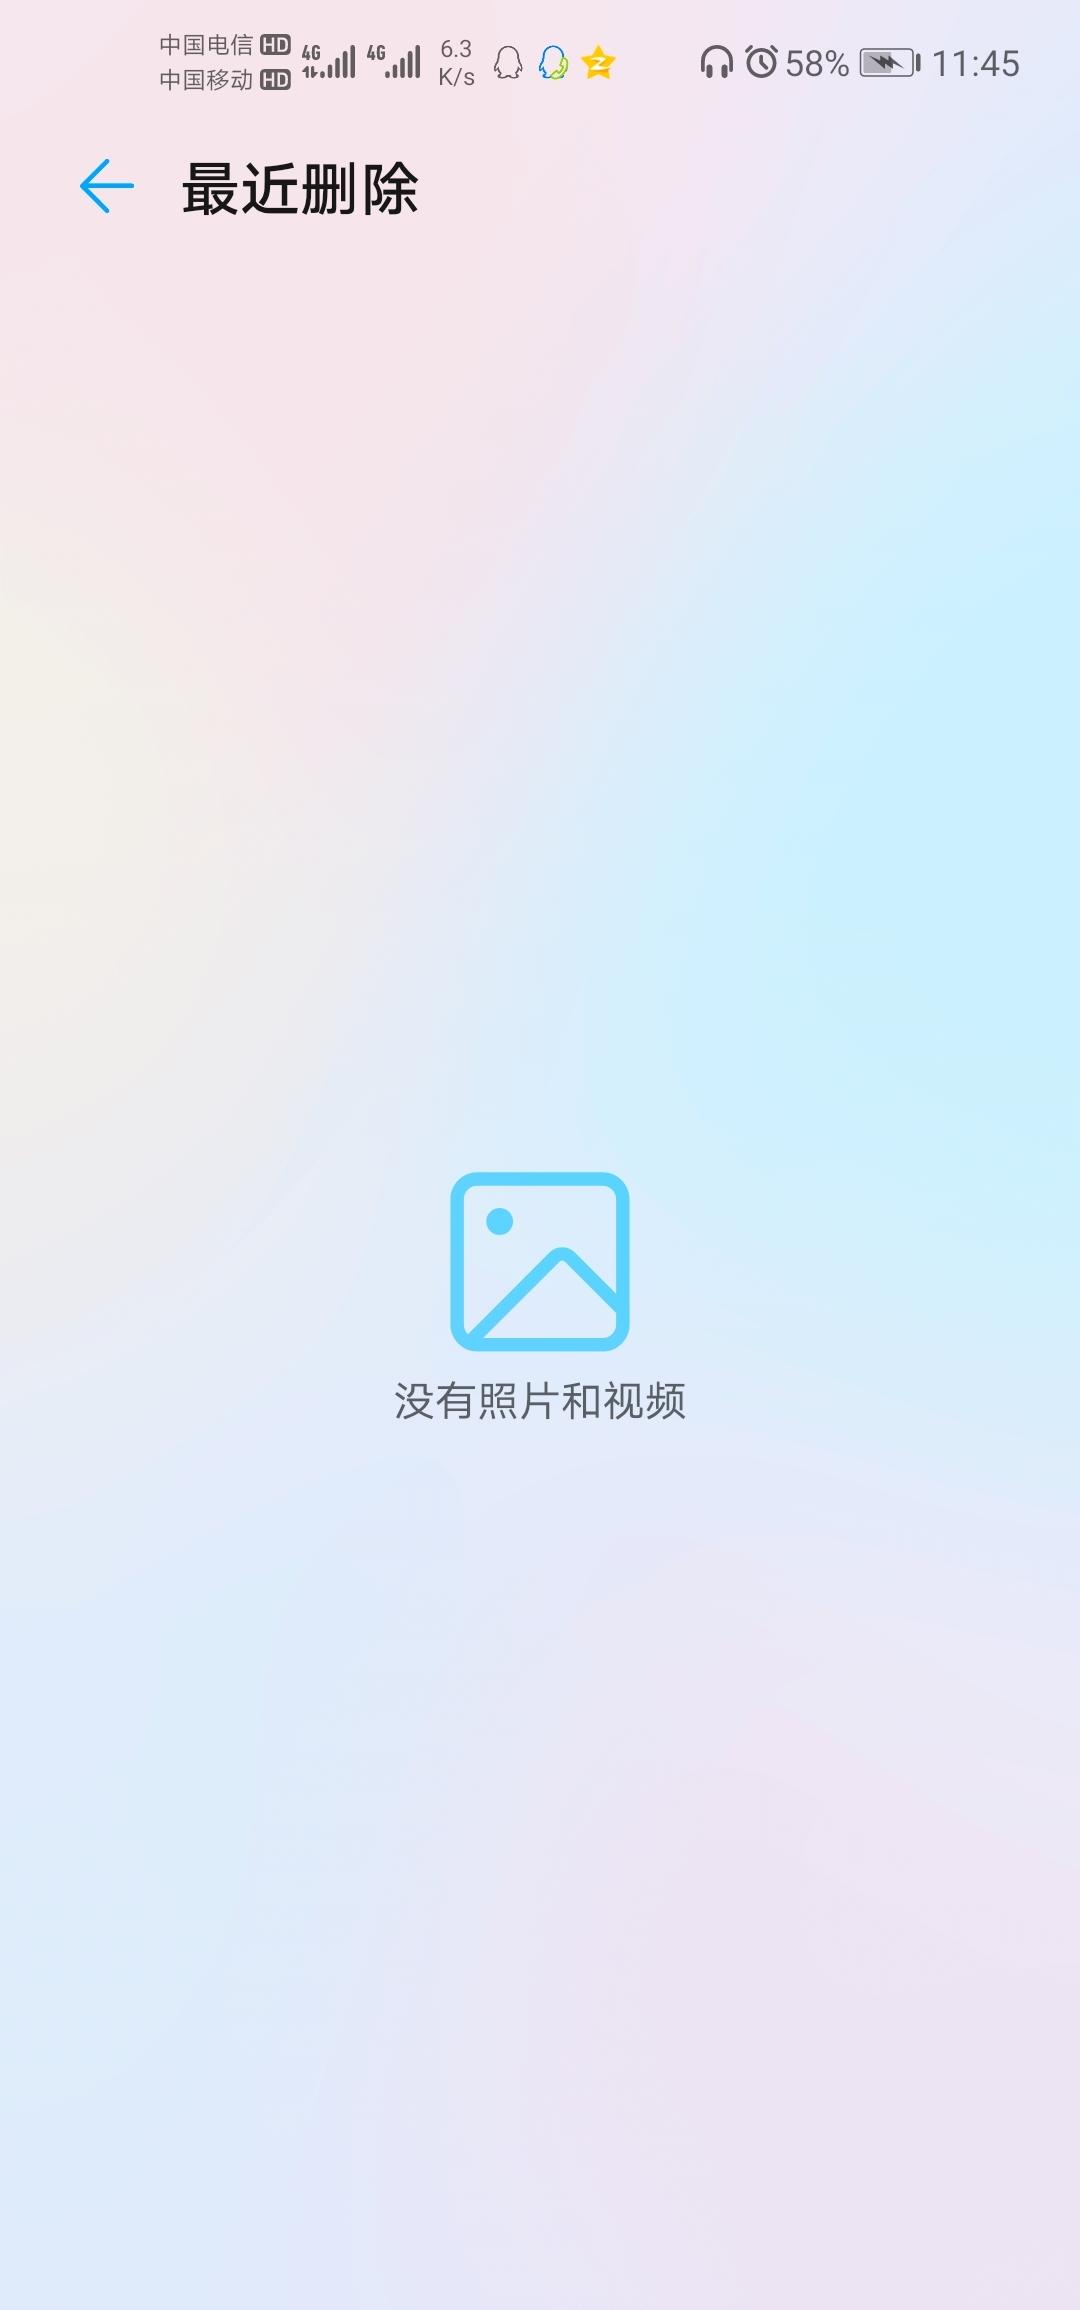 Screenshot_20200516_234515_com.android.gallery3d.jpg